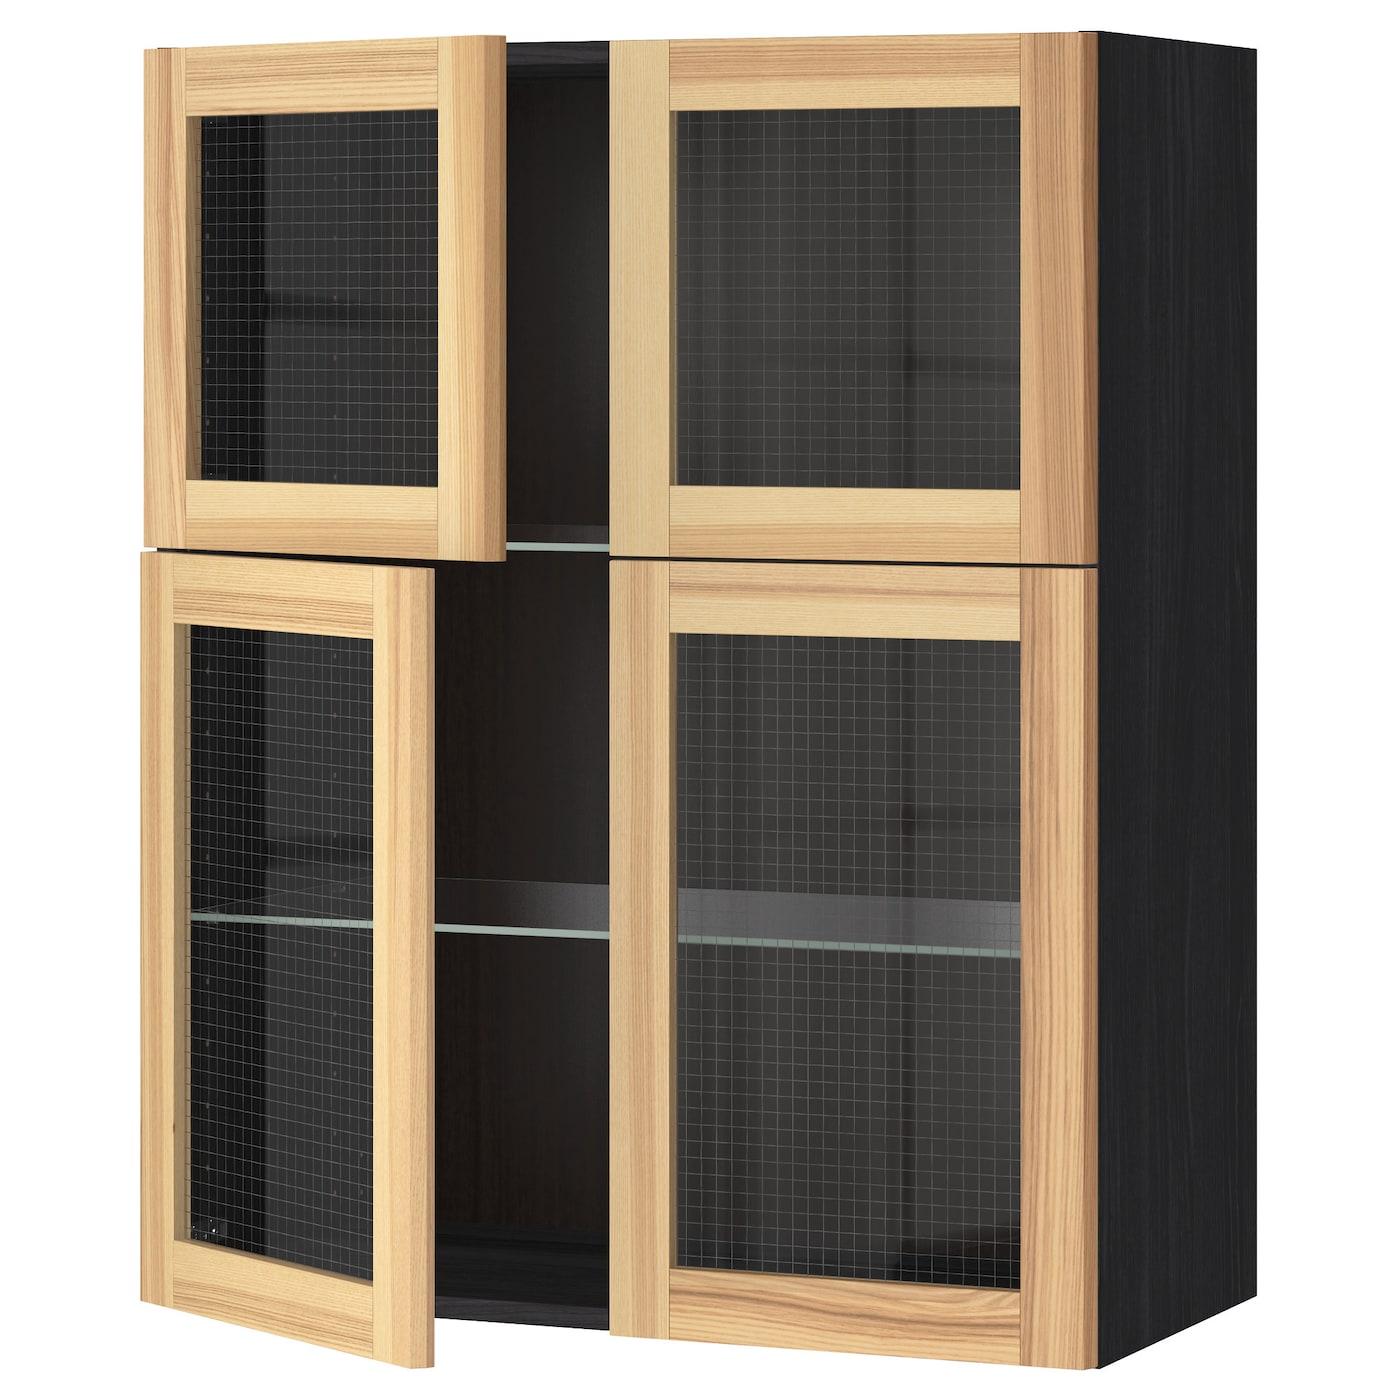 Metod wall cabinet w shelves 4 glass drs black torhamn ash - Ikea wall cabinets ...